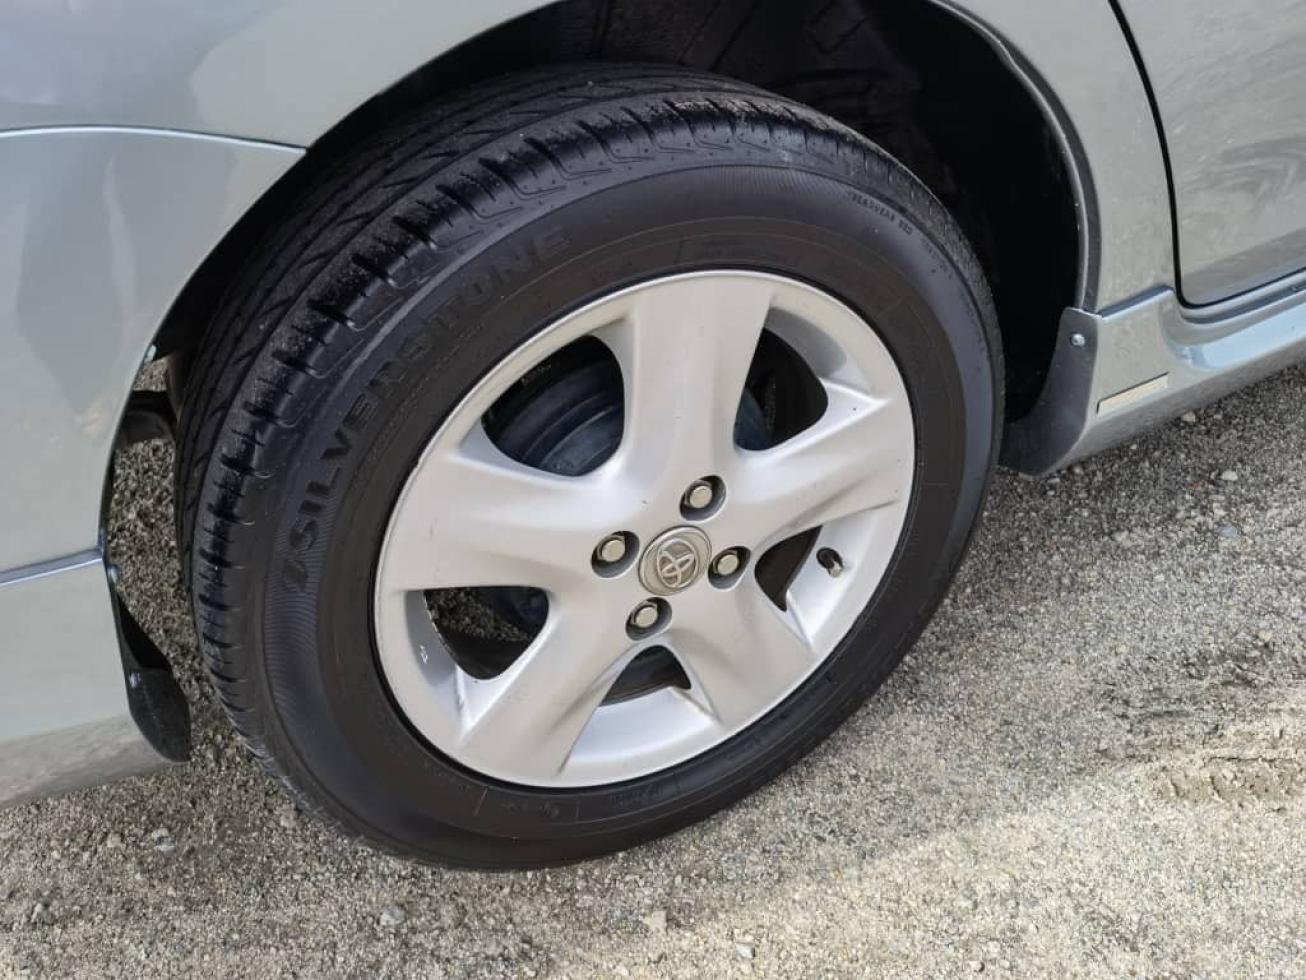 2011 Toyota VIOS 1.5J (A) FULL LOANZERO DEPOSIT